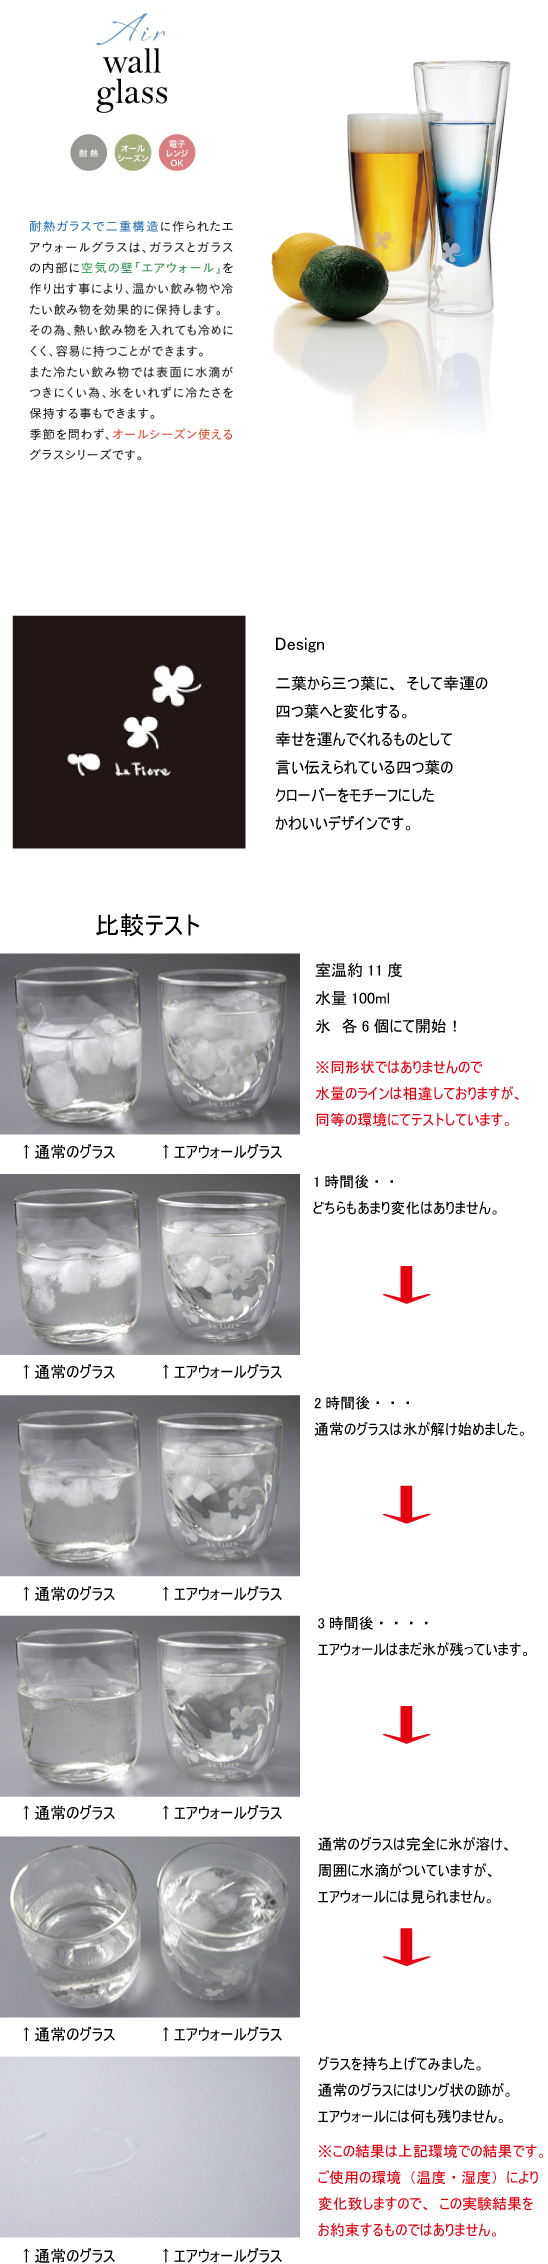 http://www.rakuten.ne.jp/gold/lafiore/air_wall_main3.jpg